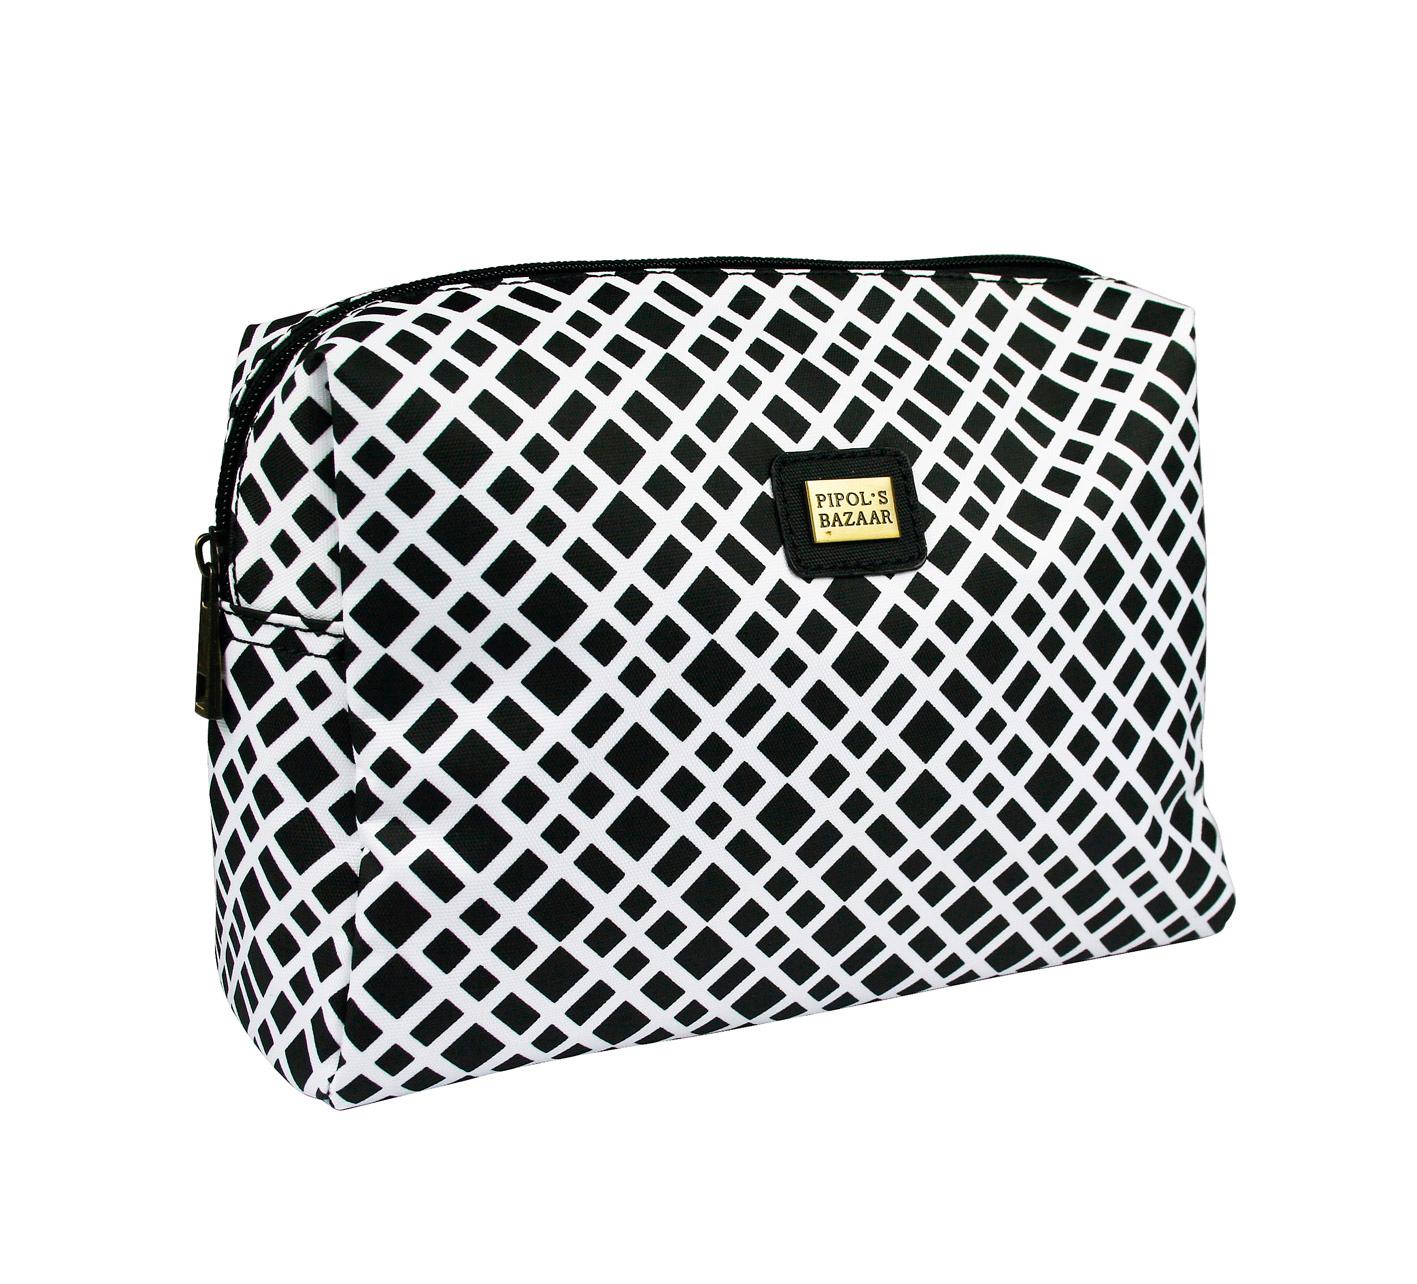 Crocetta Big Cosmetic bag black & white